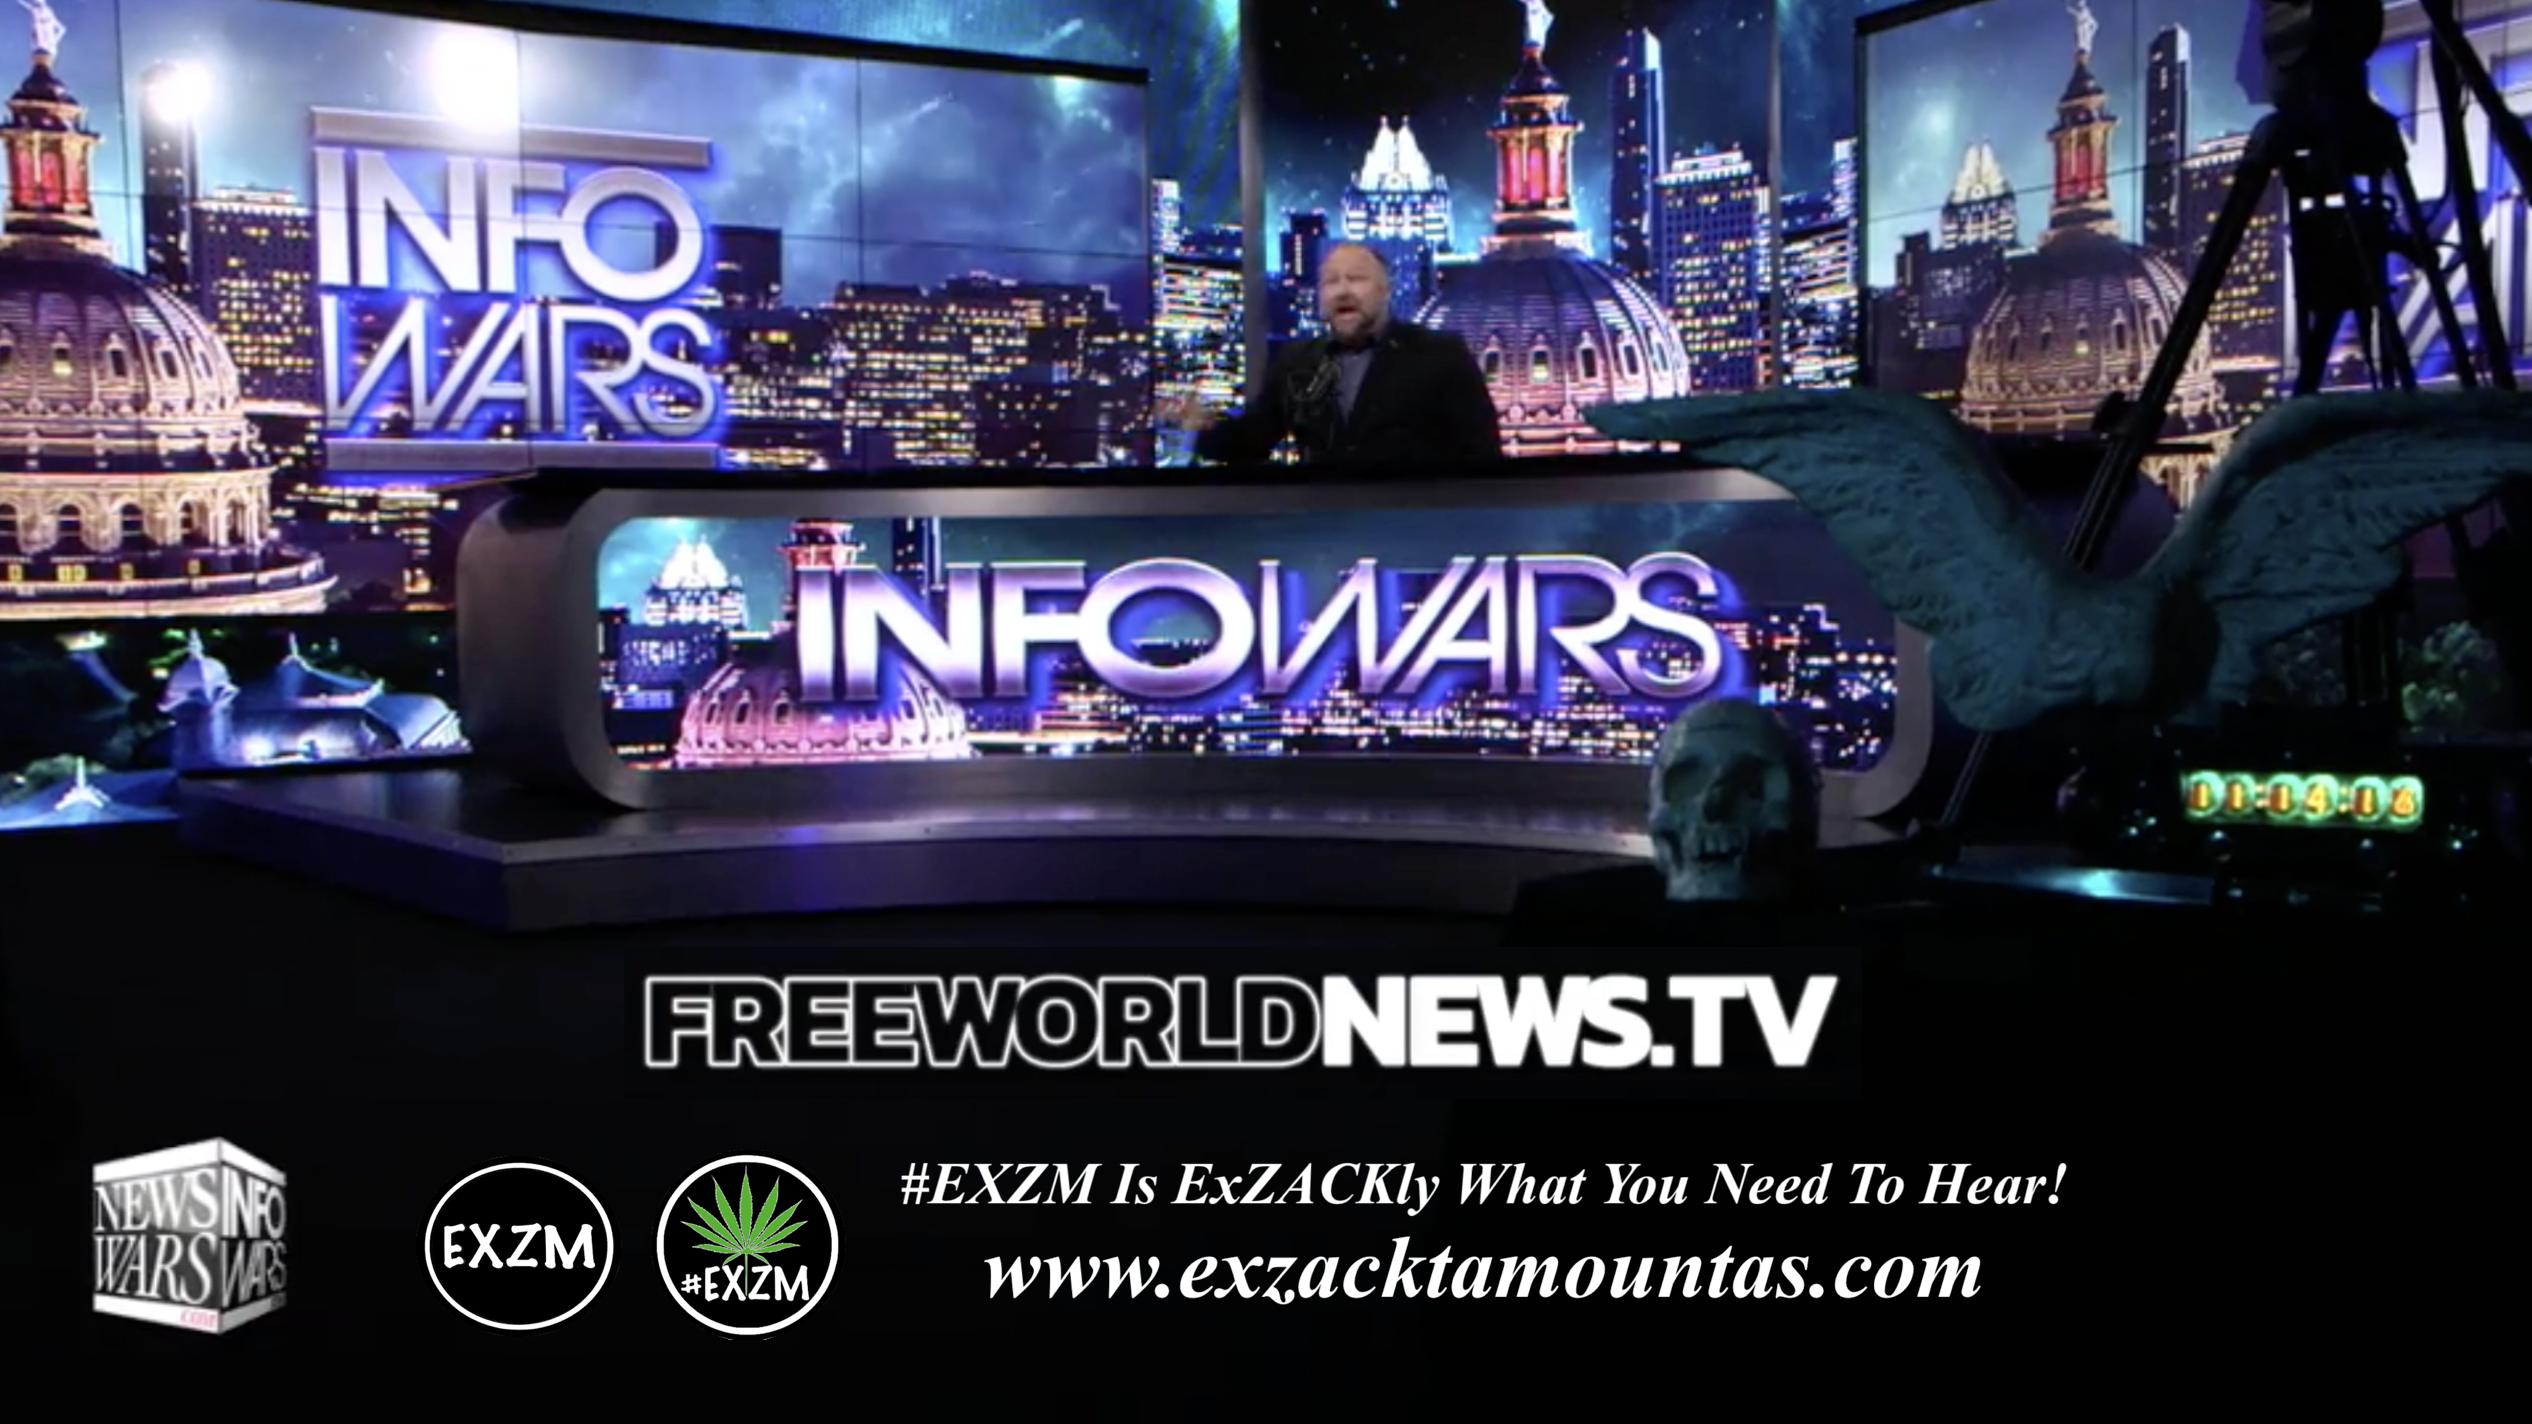 Alex Jones Live In Infowars Studio Human Skull Angel Wings Dagger Free World News TV EXZM Zack Mount June 17th 2021 copy